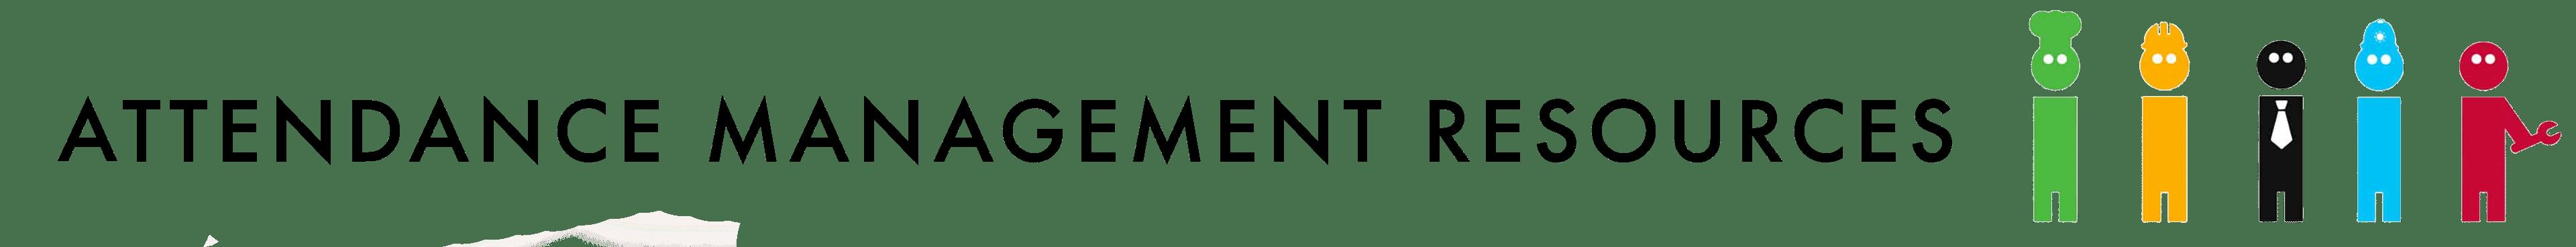 Attendance Management Resources